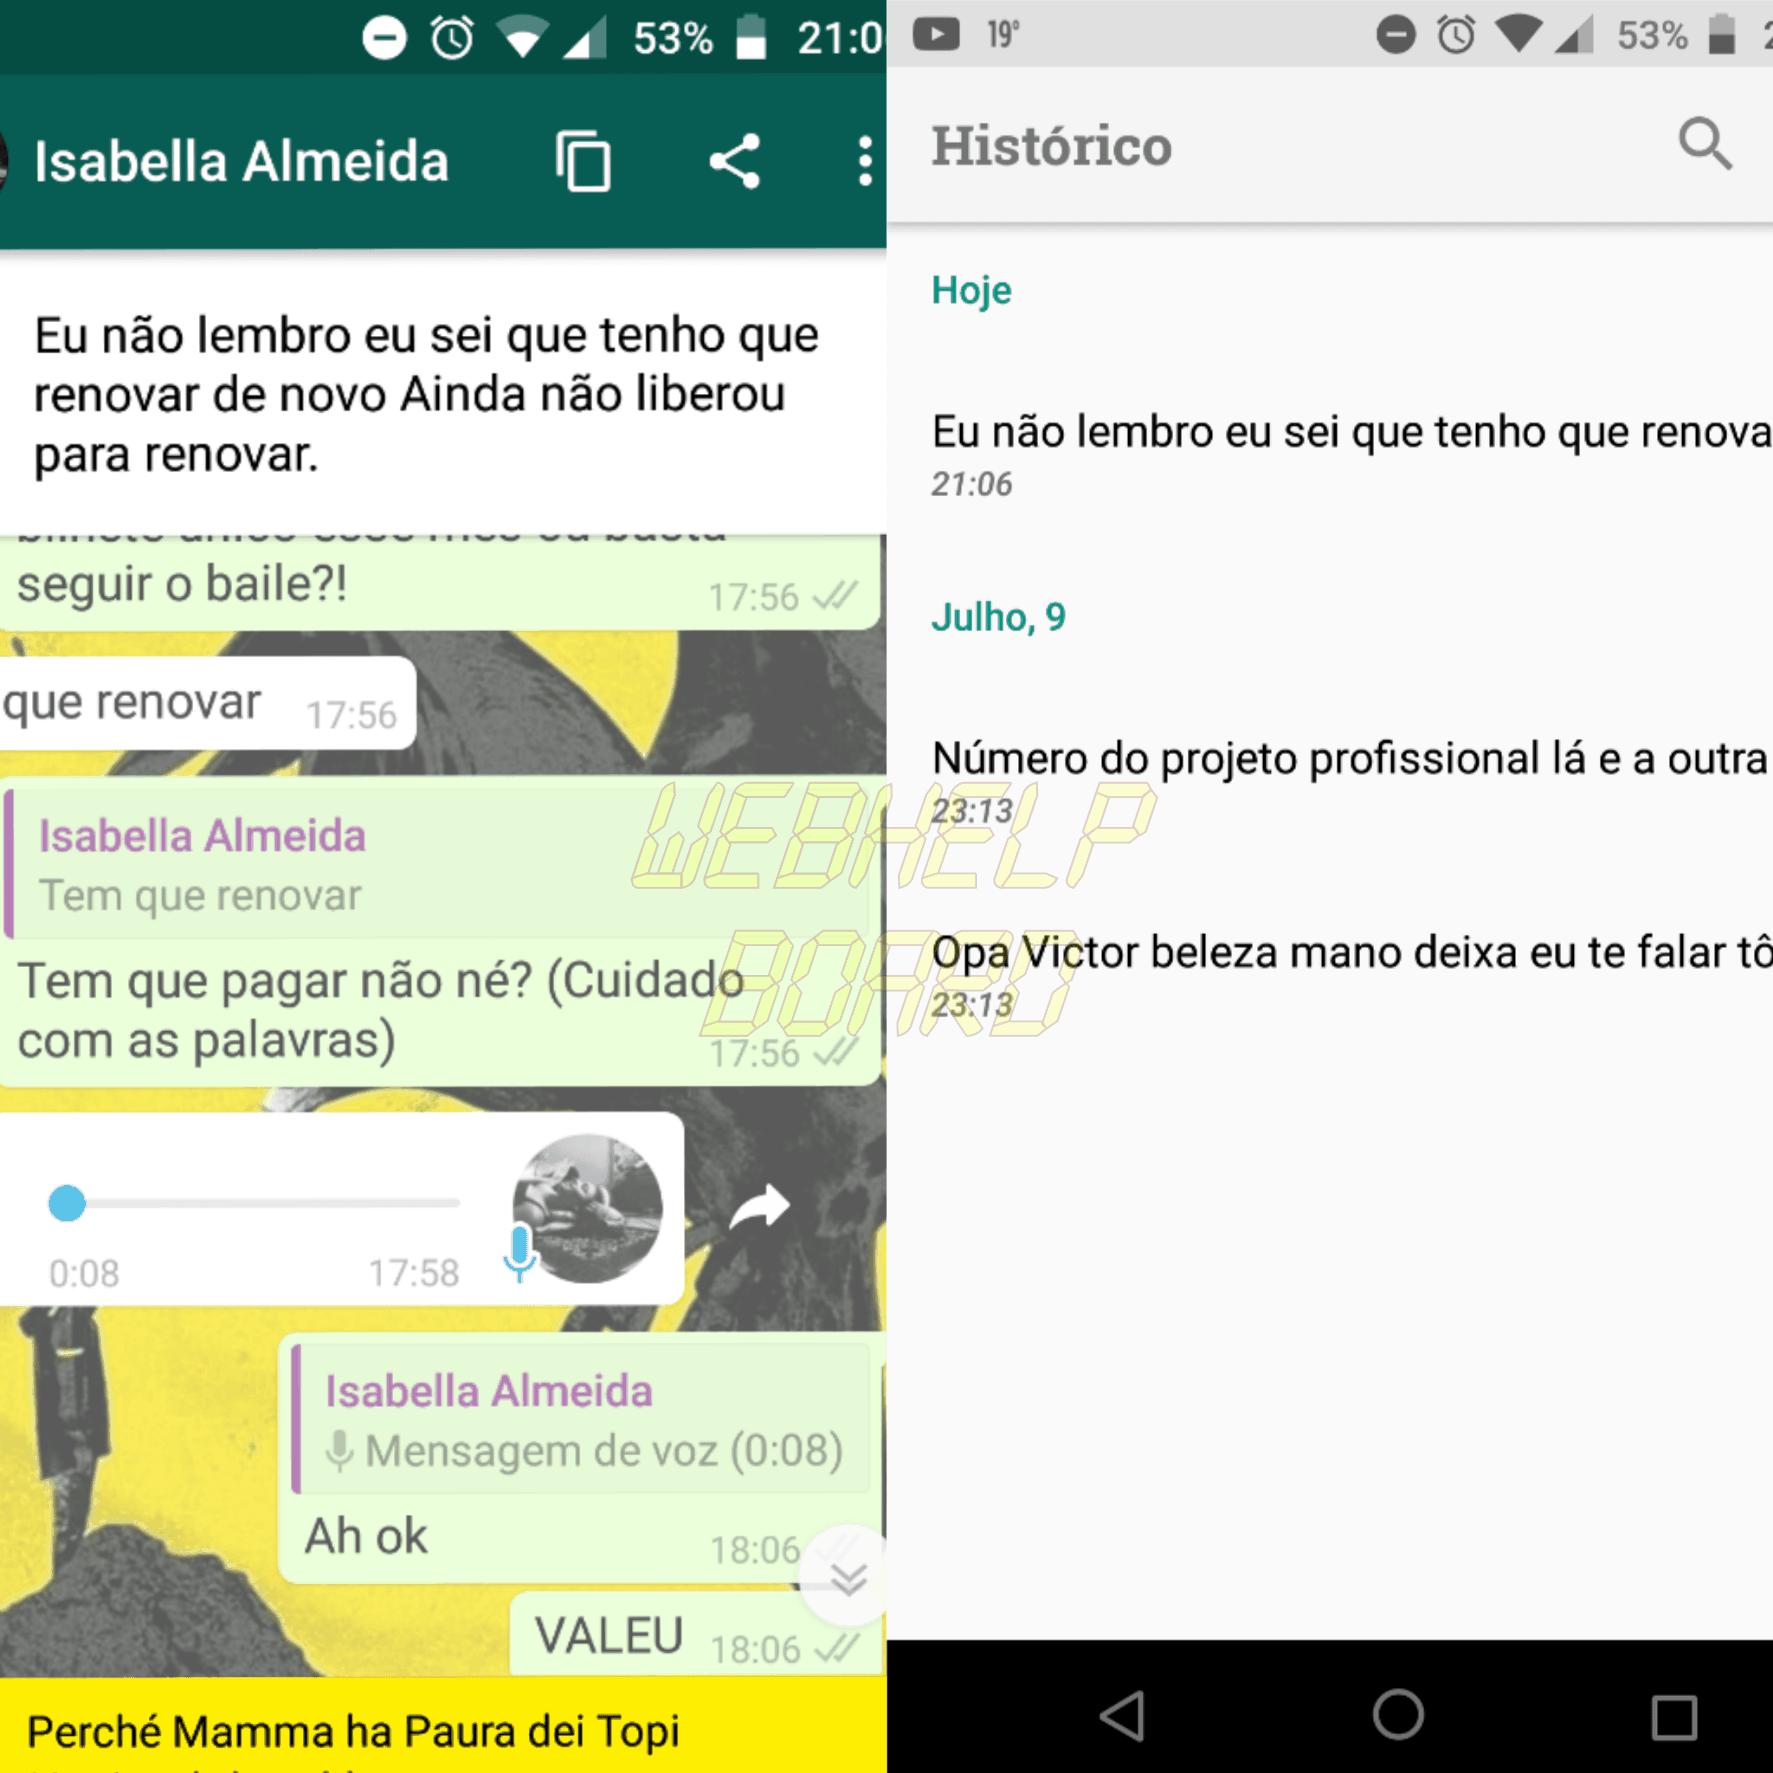 PicsArt 07 13 09.10.41 - WhatsApp: saiba como converter as mensagens de áudio para texto